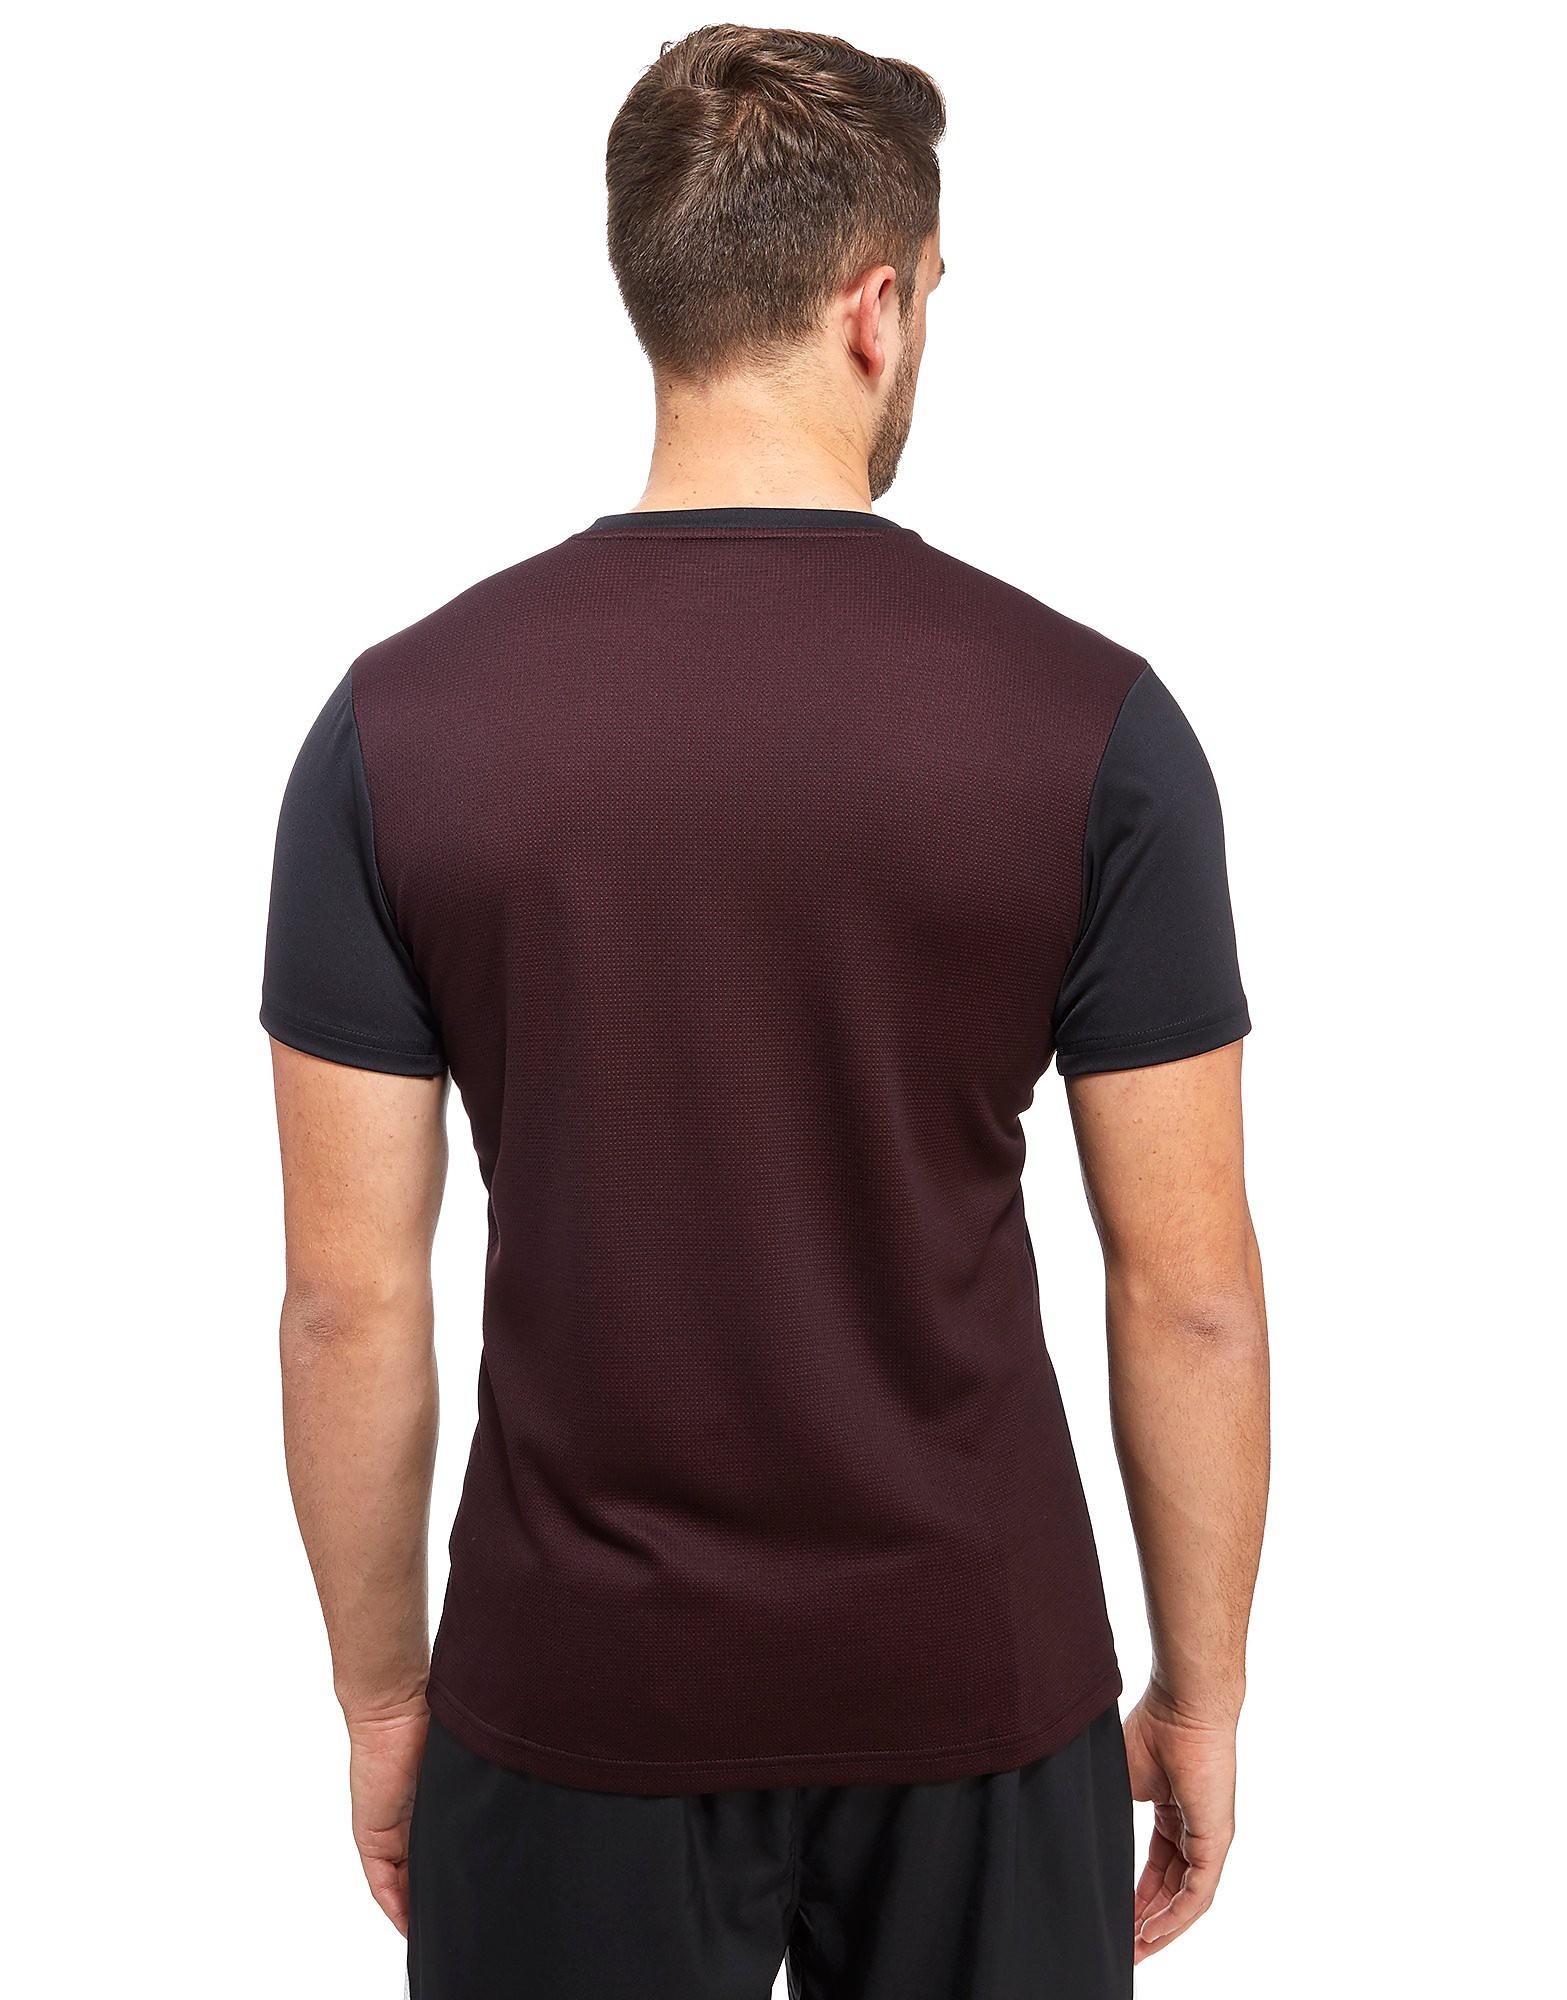 New Balance Liverpool FC 2017 Training Shirt